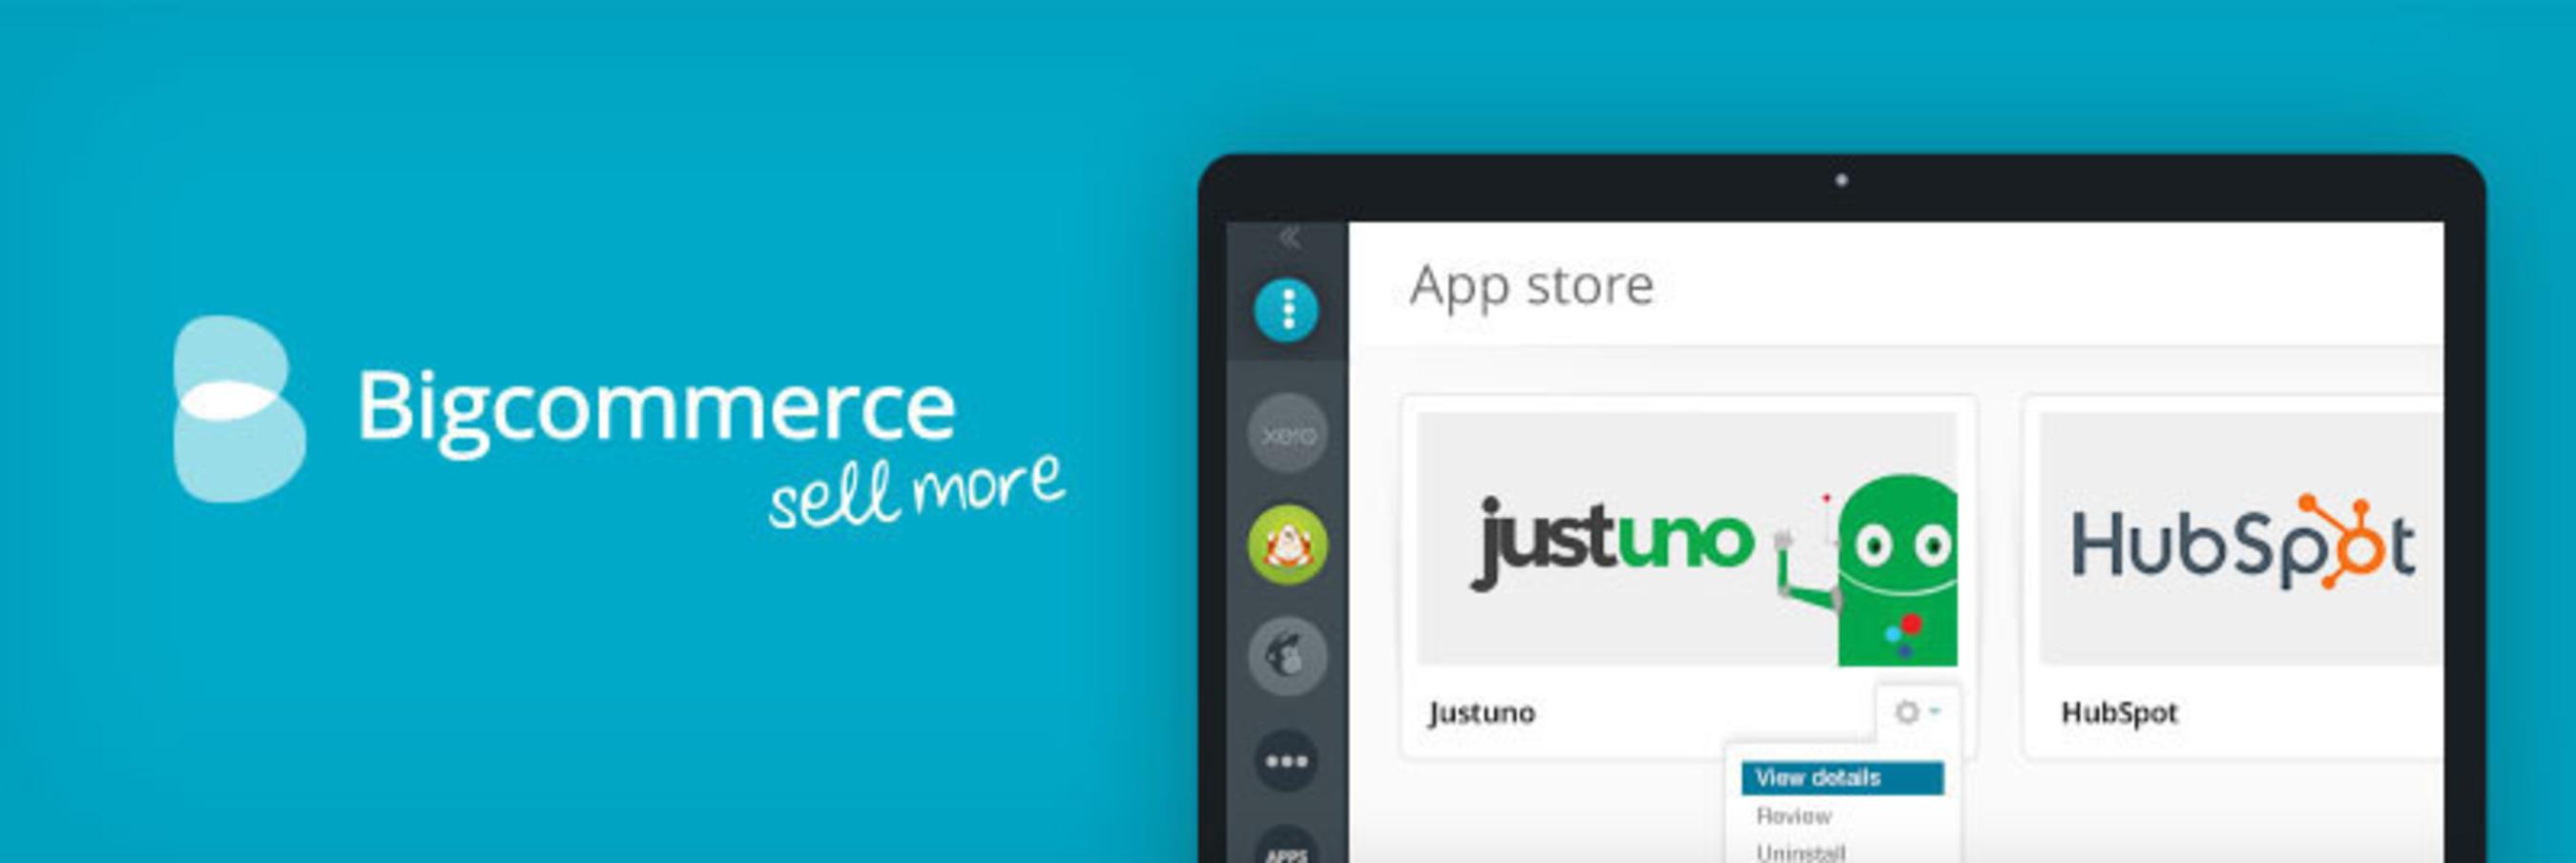 Single Click Apps. (PRNewsFoto/Bigcommerce) (PRNewsFoto/BIGCOMMERCE)